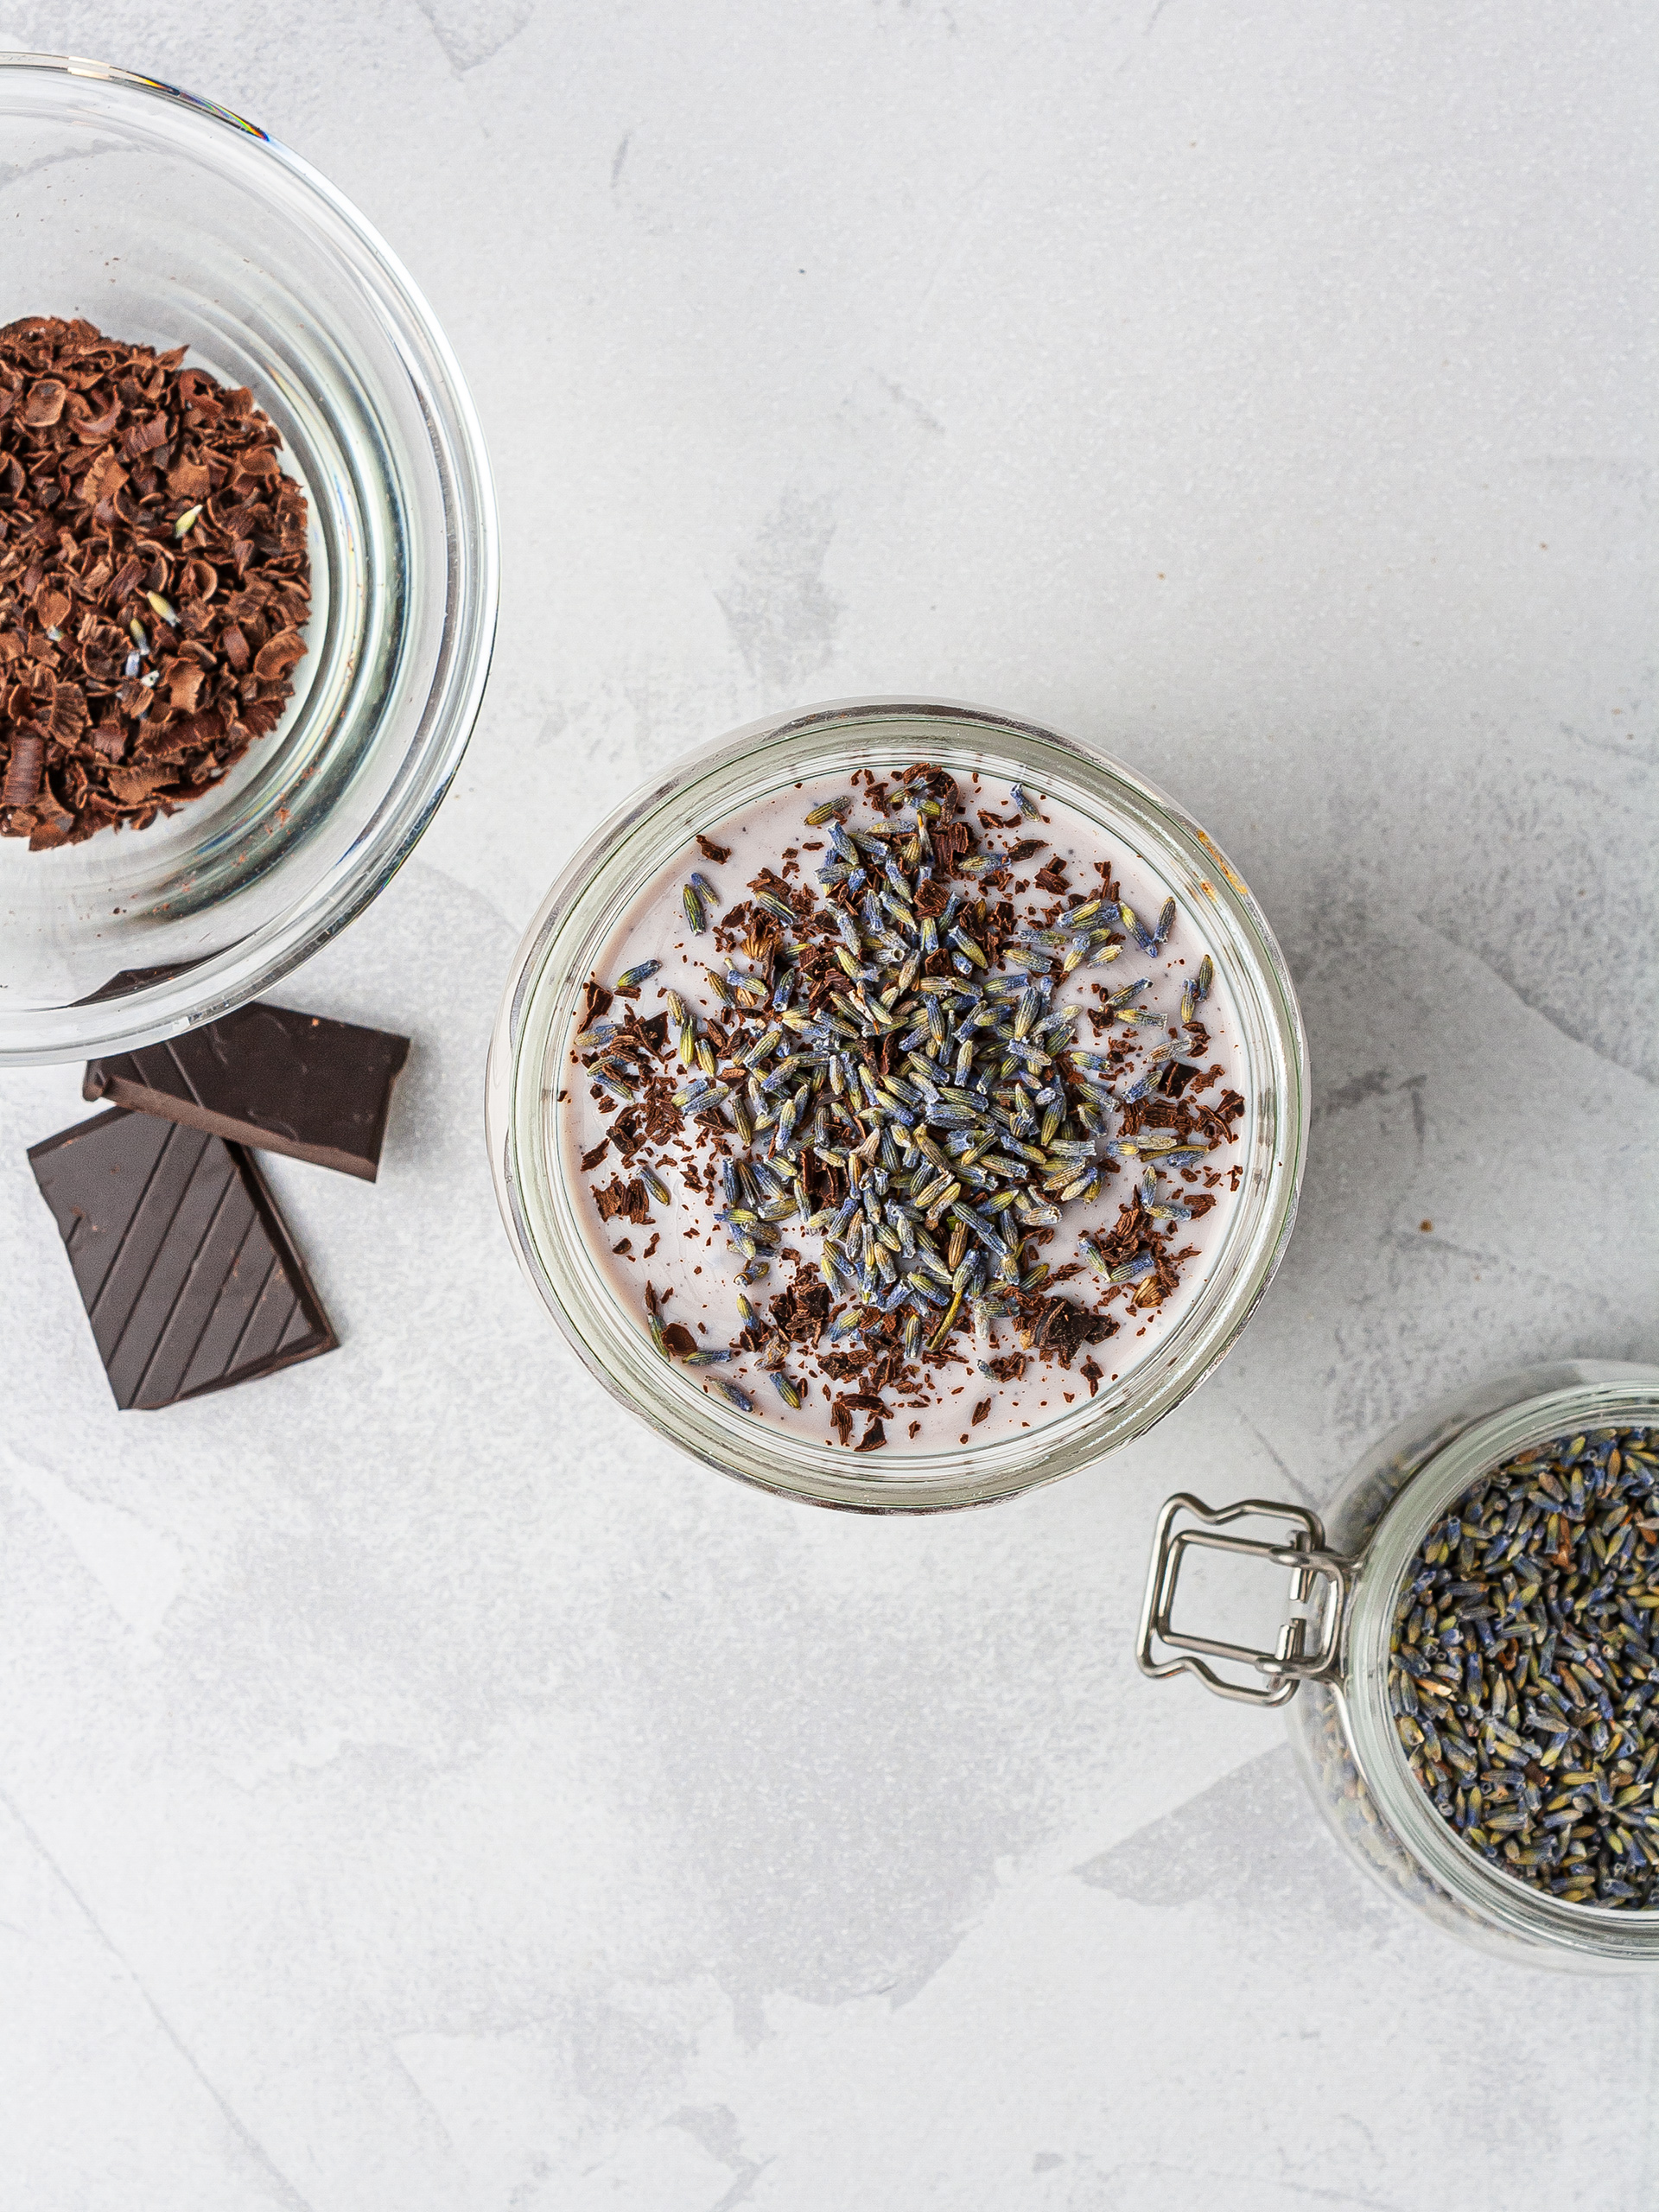 Step 3.2 of Anti-Anxiety Lavender Smoothie Recipe